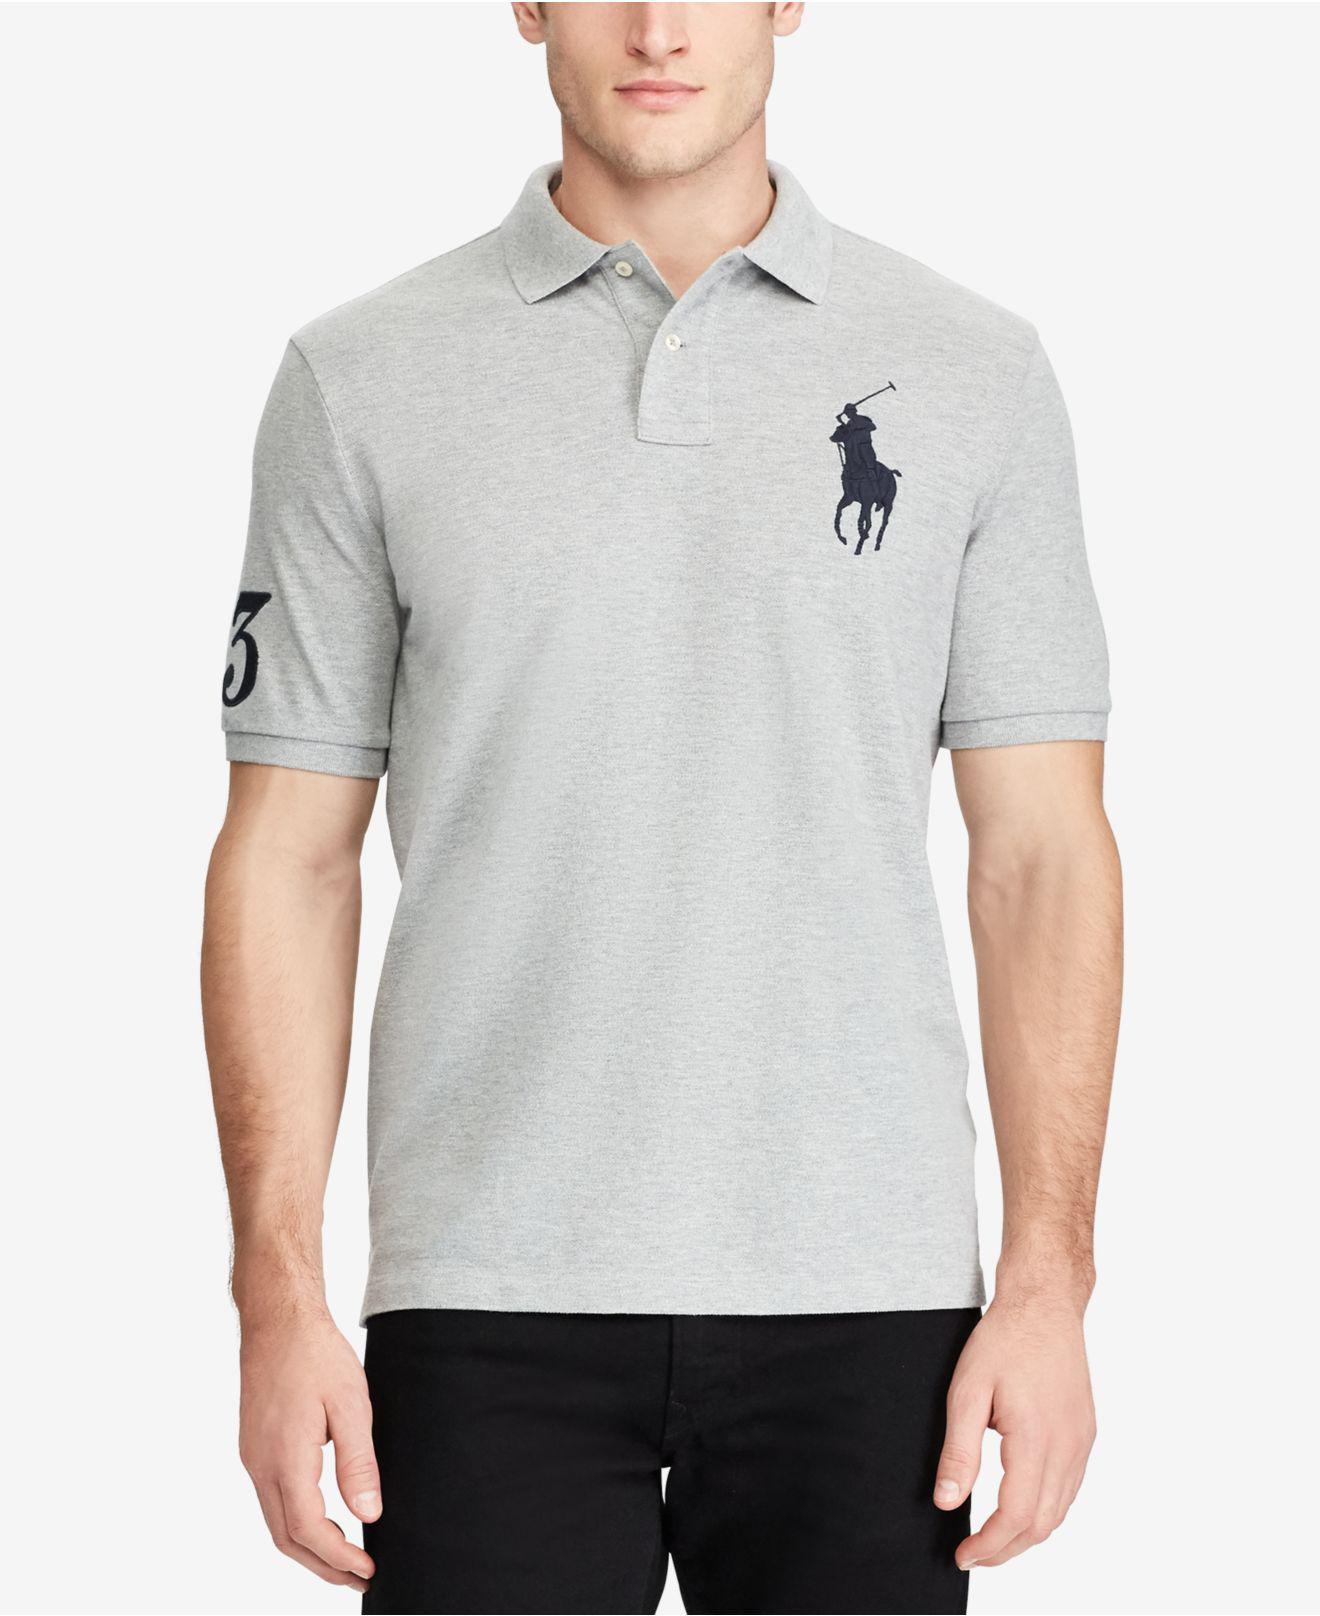 bdd640de3c18 ... top quality shirt bloomingdales2 polo ralph lauren gray mens classic  fit mesh polo for men lyst